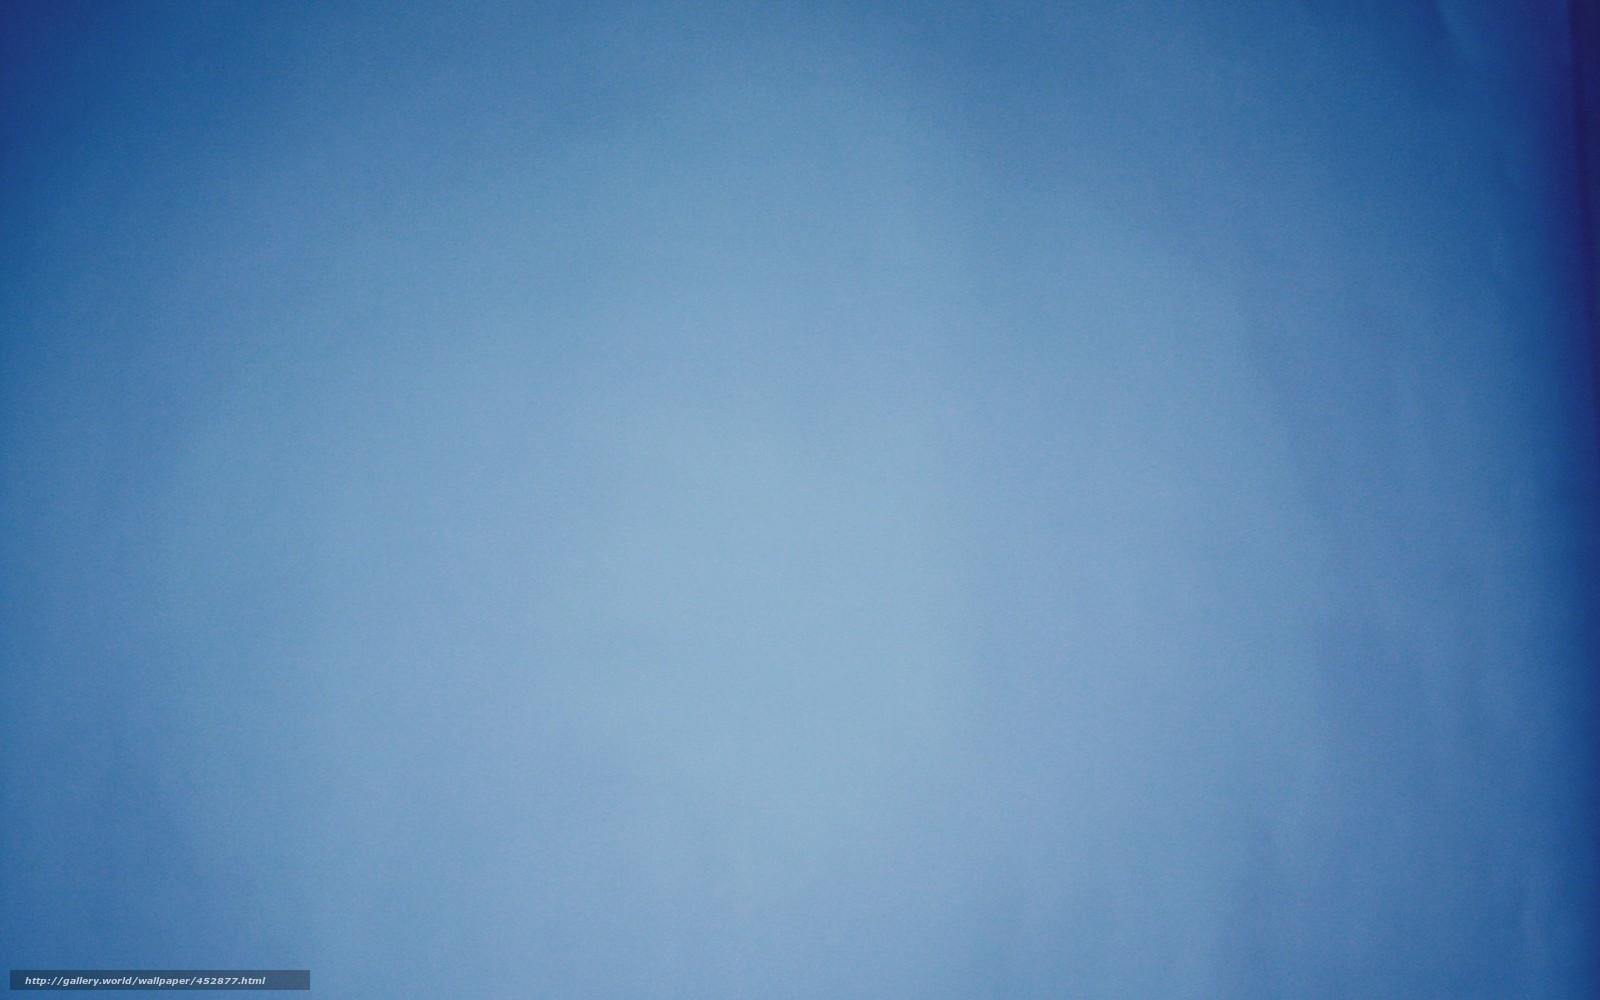 tlcharger fond d u0026 39 ecran bleu  bleu  couleur  fond fonds d